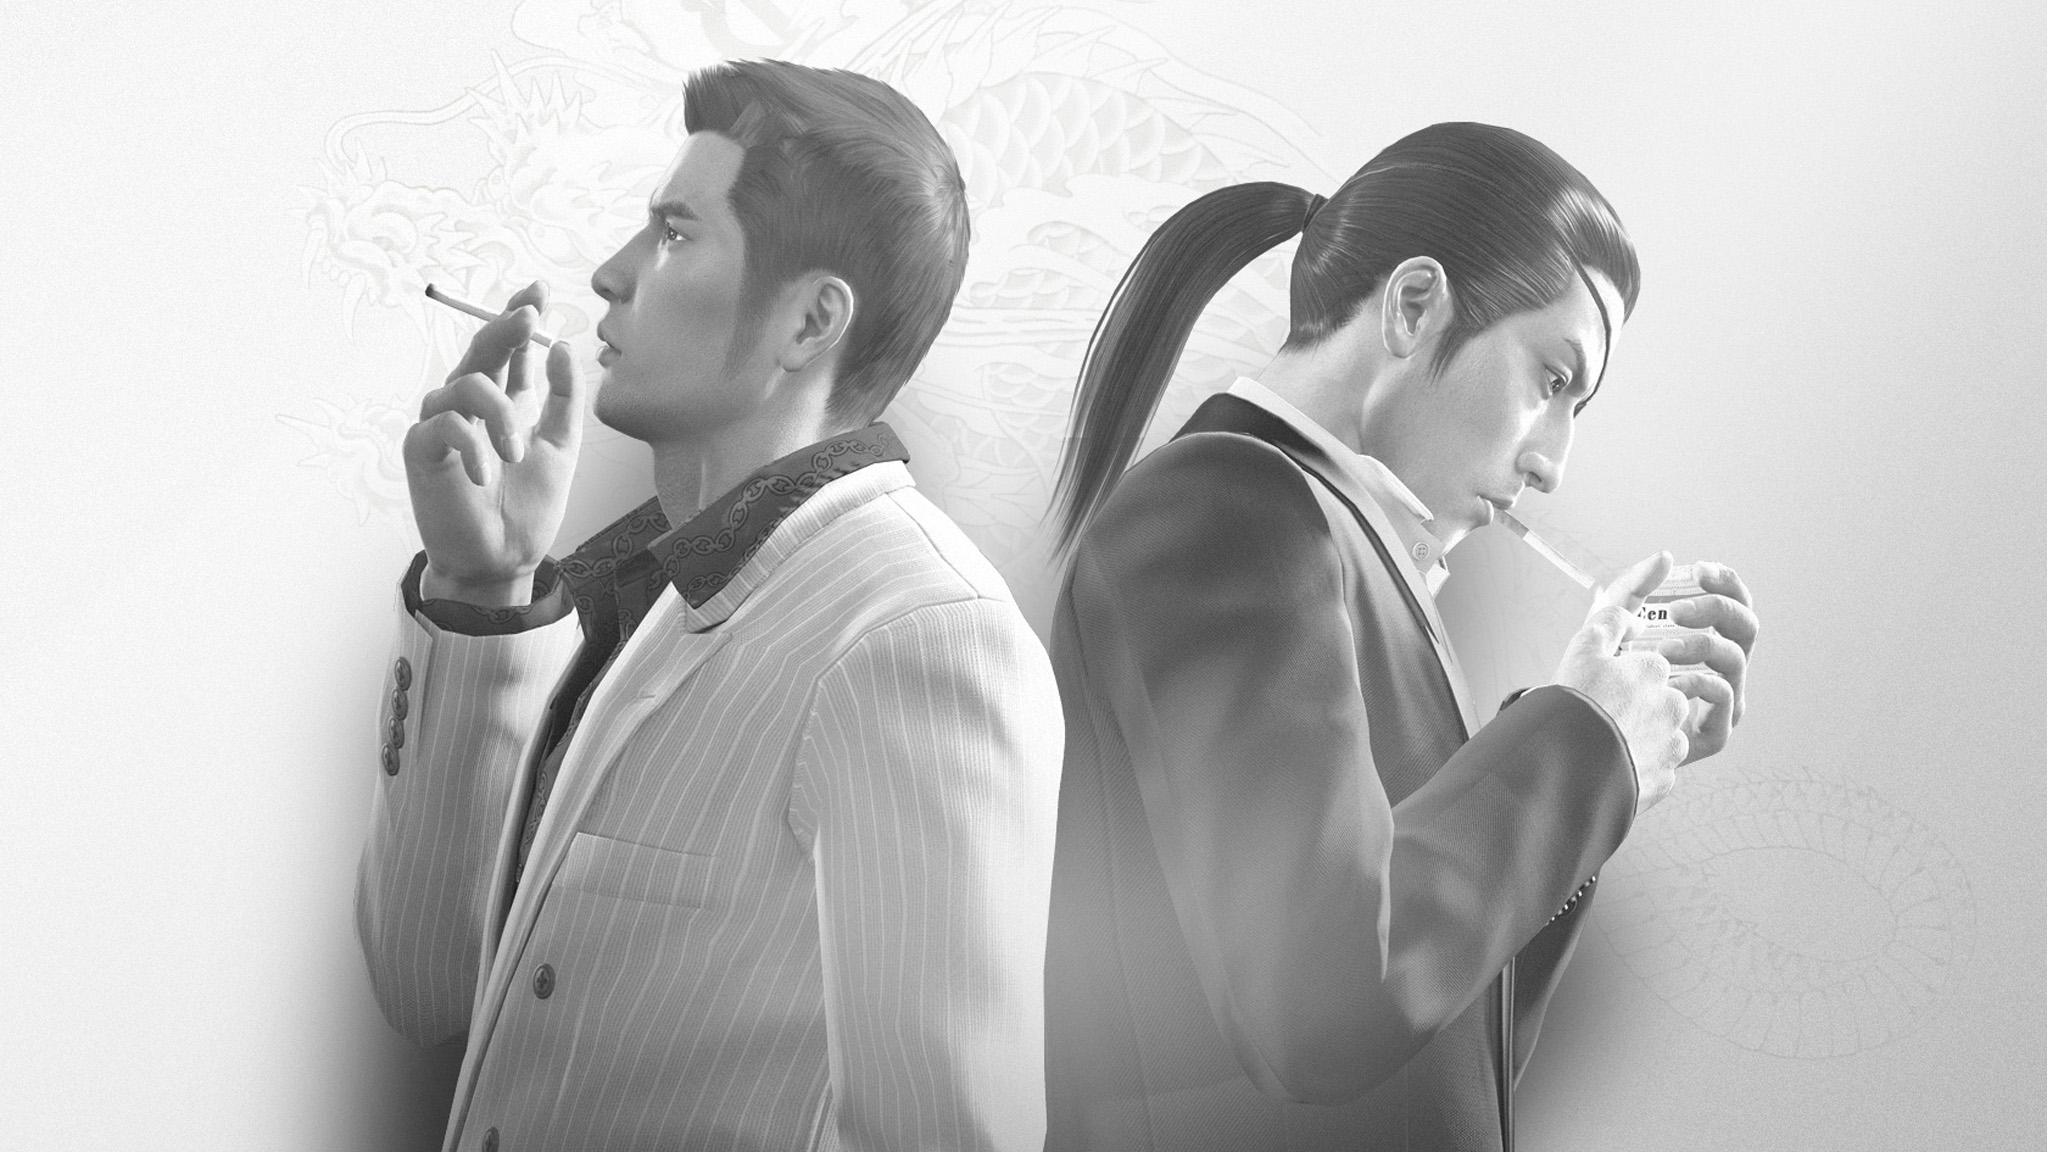 Yakuza 0 Wallpapers Video Game Hq Yakuza 0 Pictures 4k Wallpapers 2019